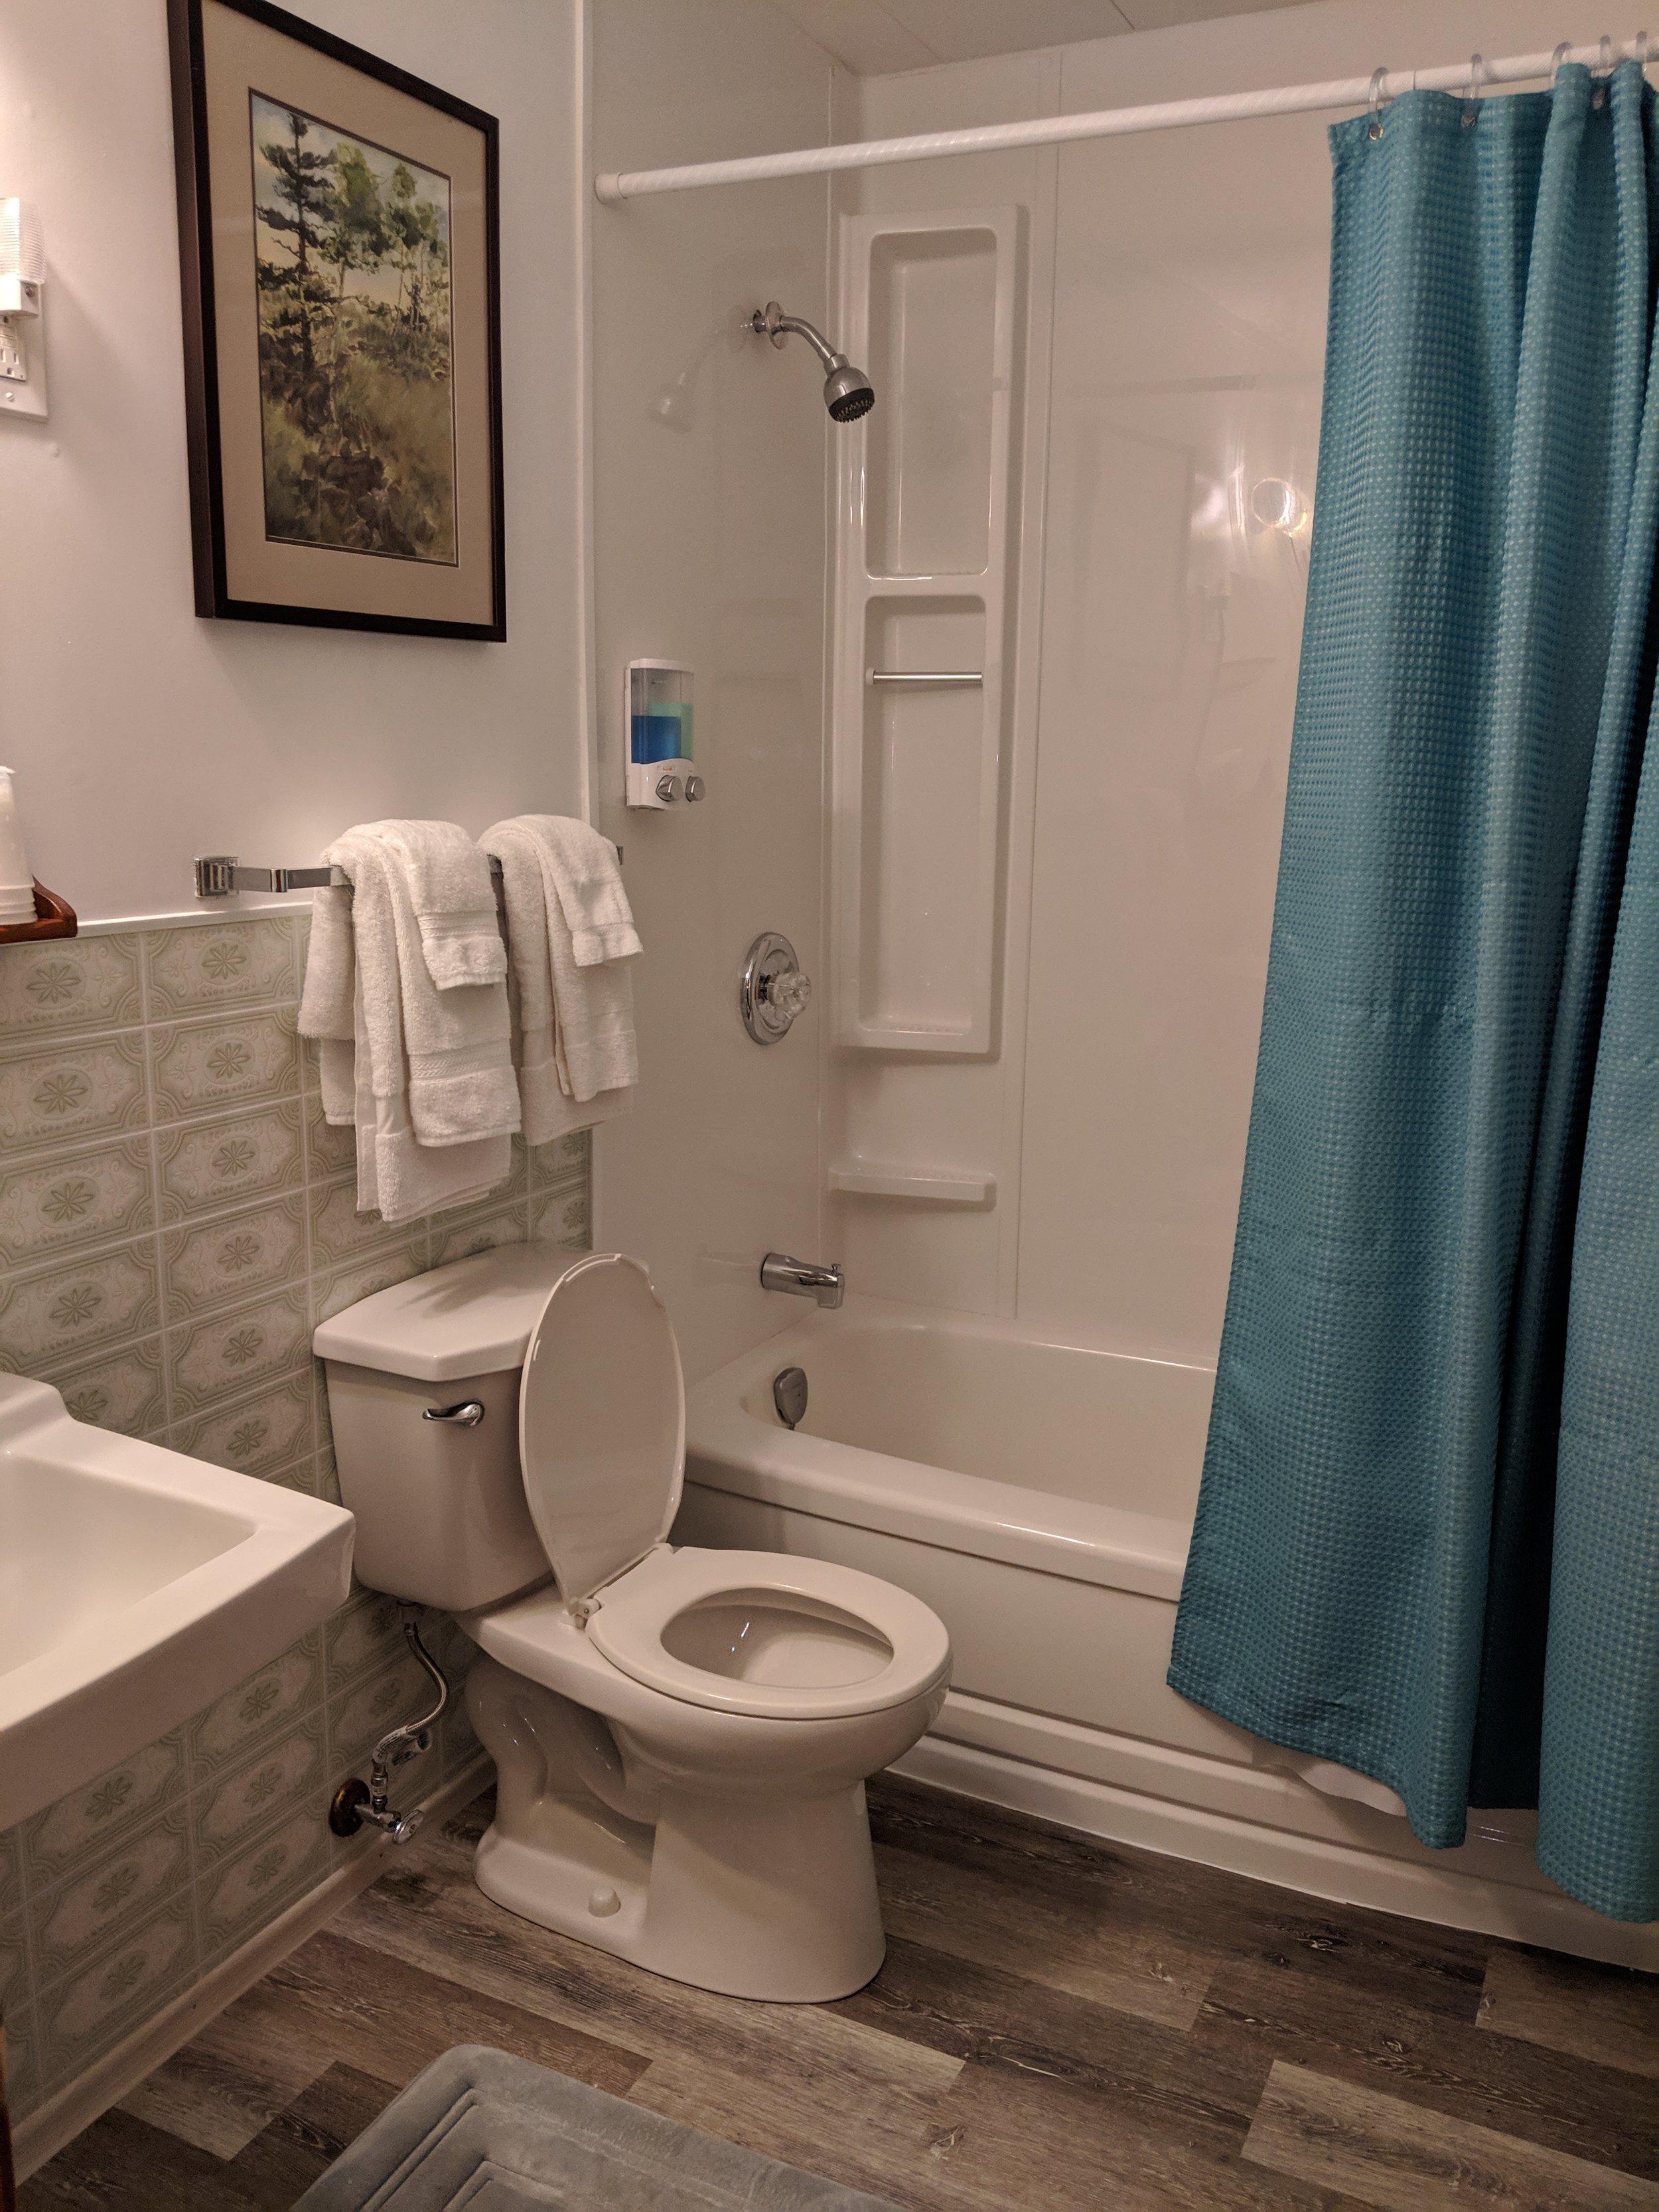 Room 17 renovations